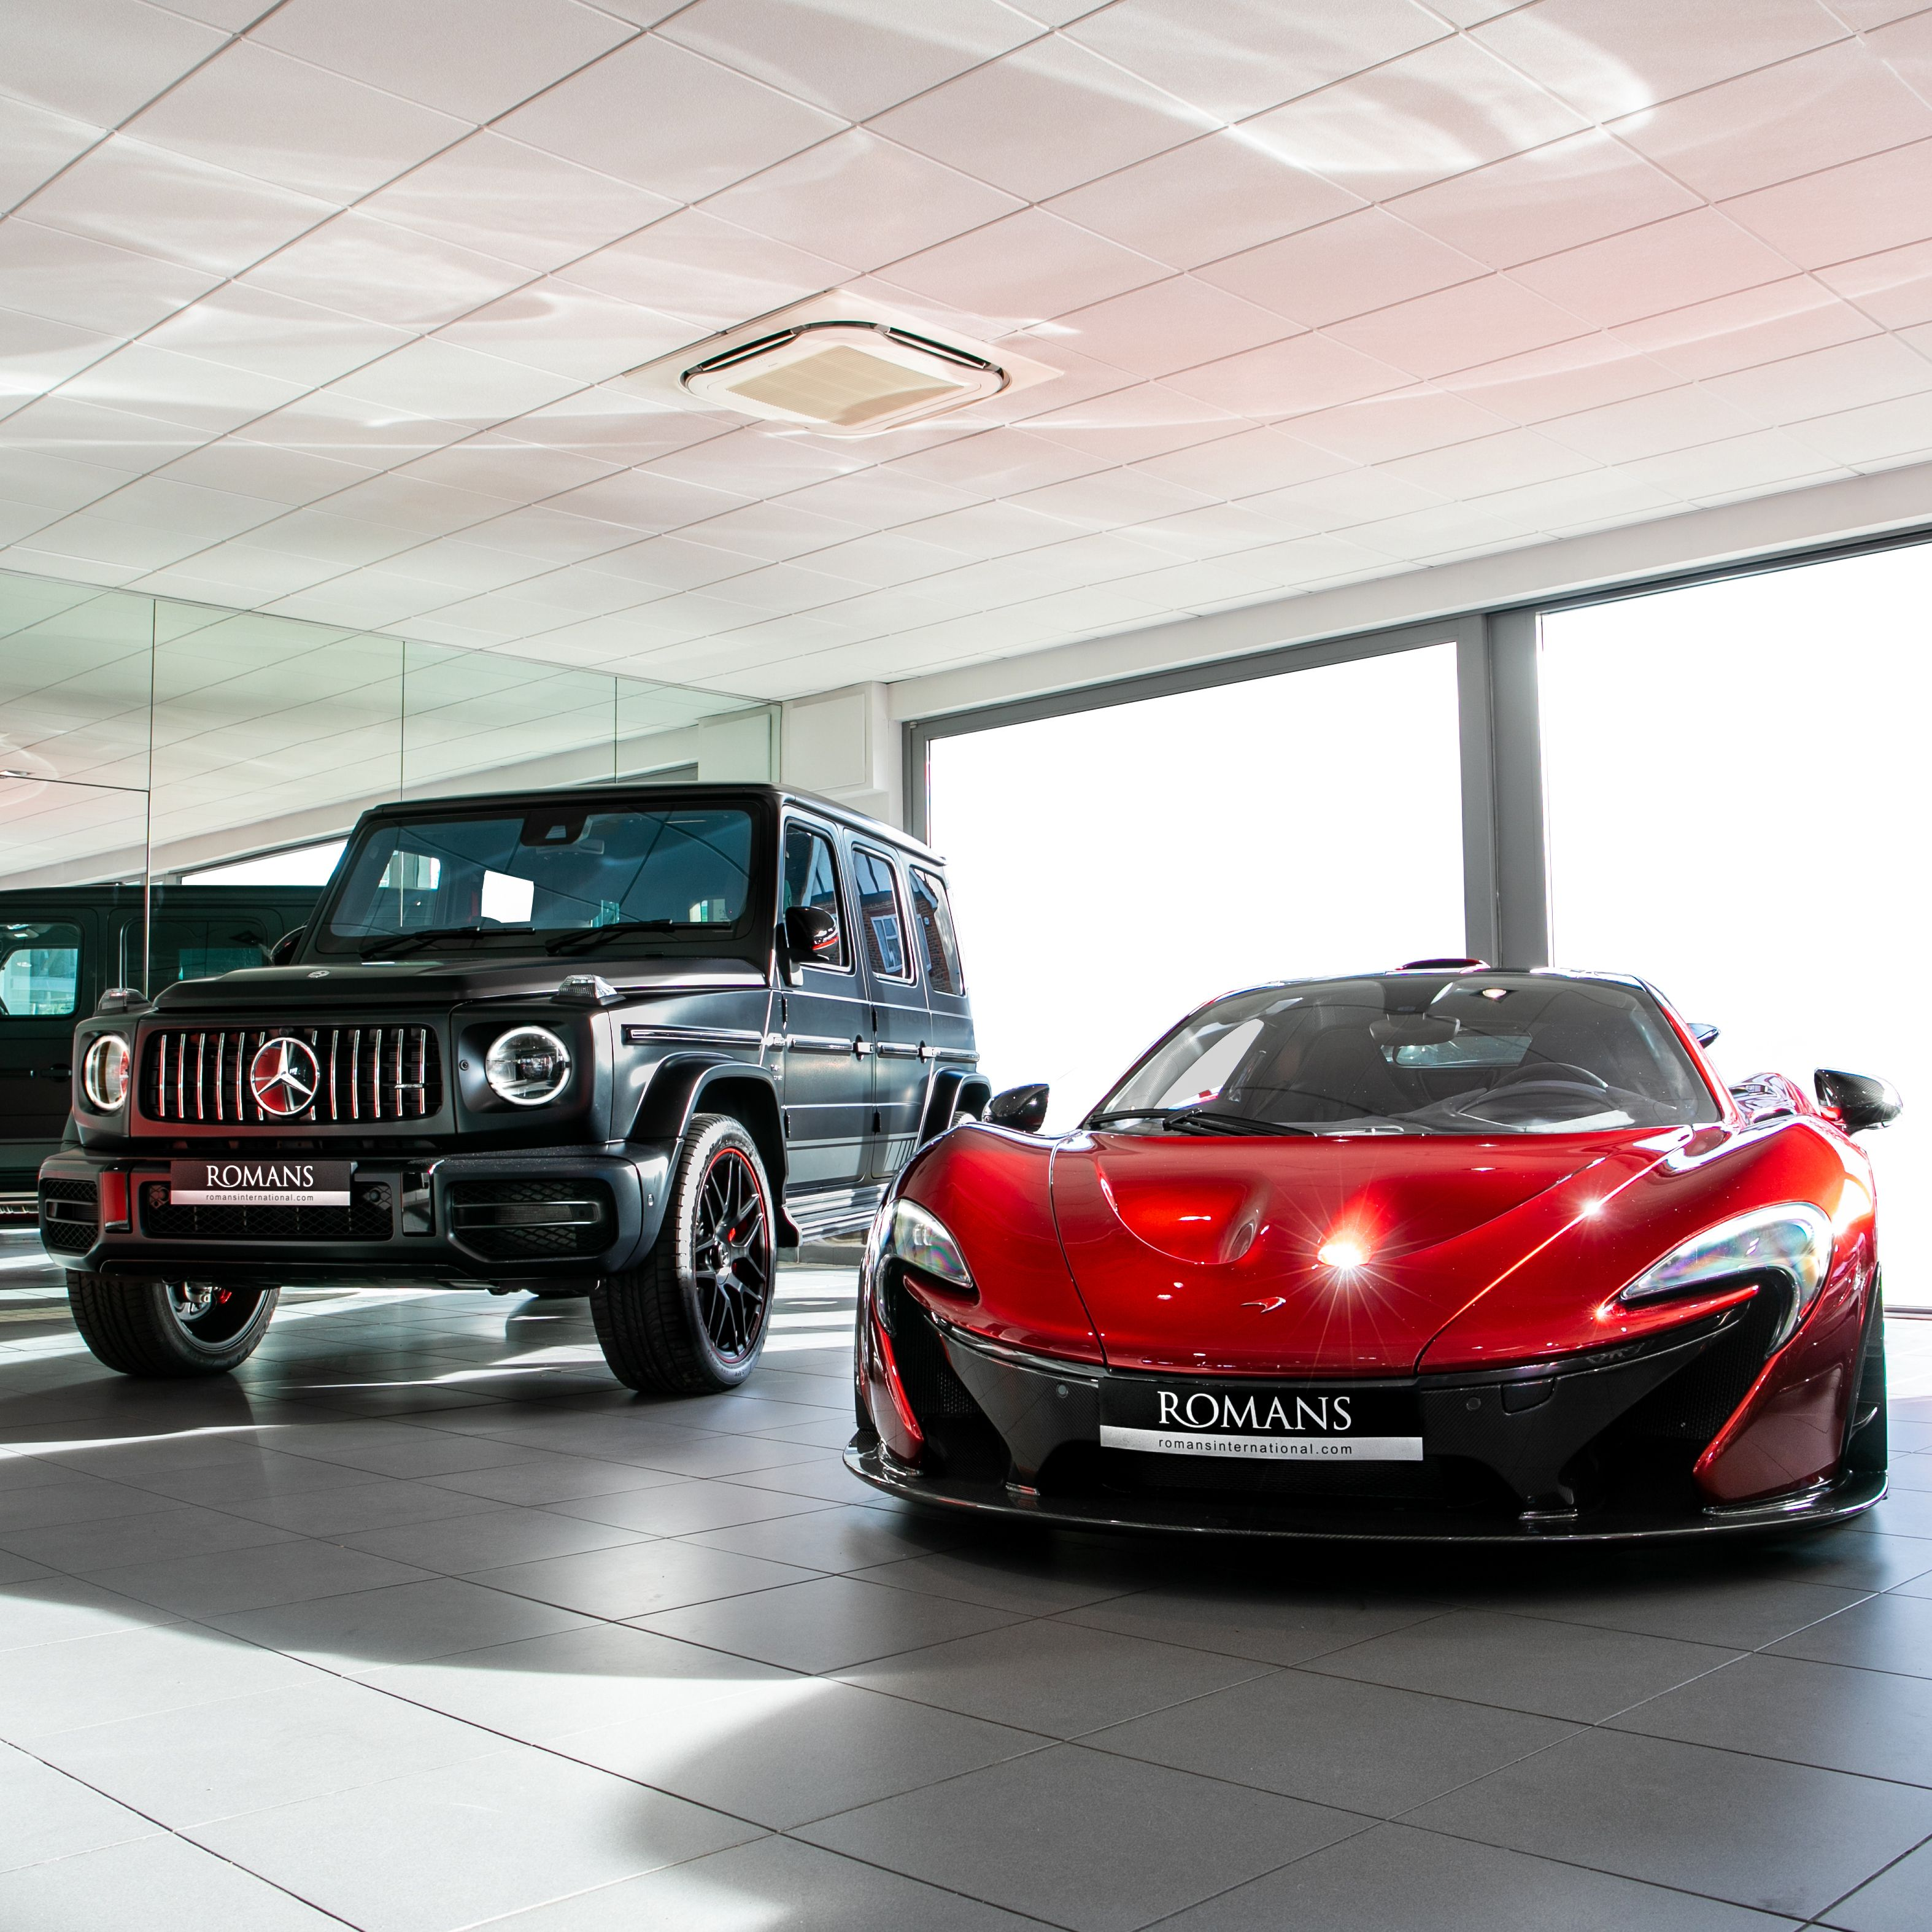 David VS Goliath #McLaren #P1 #MercedesAMG #G63 #G63AMG